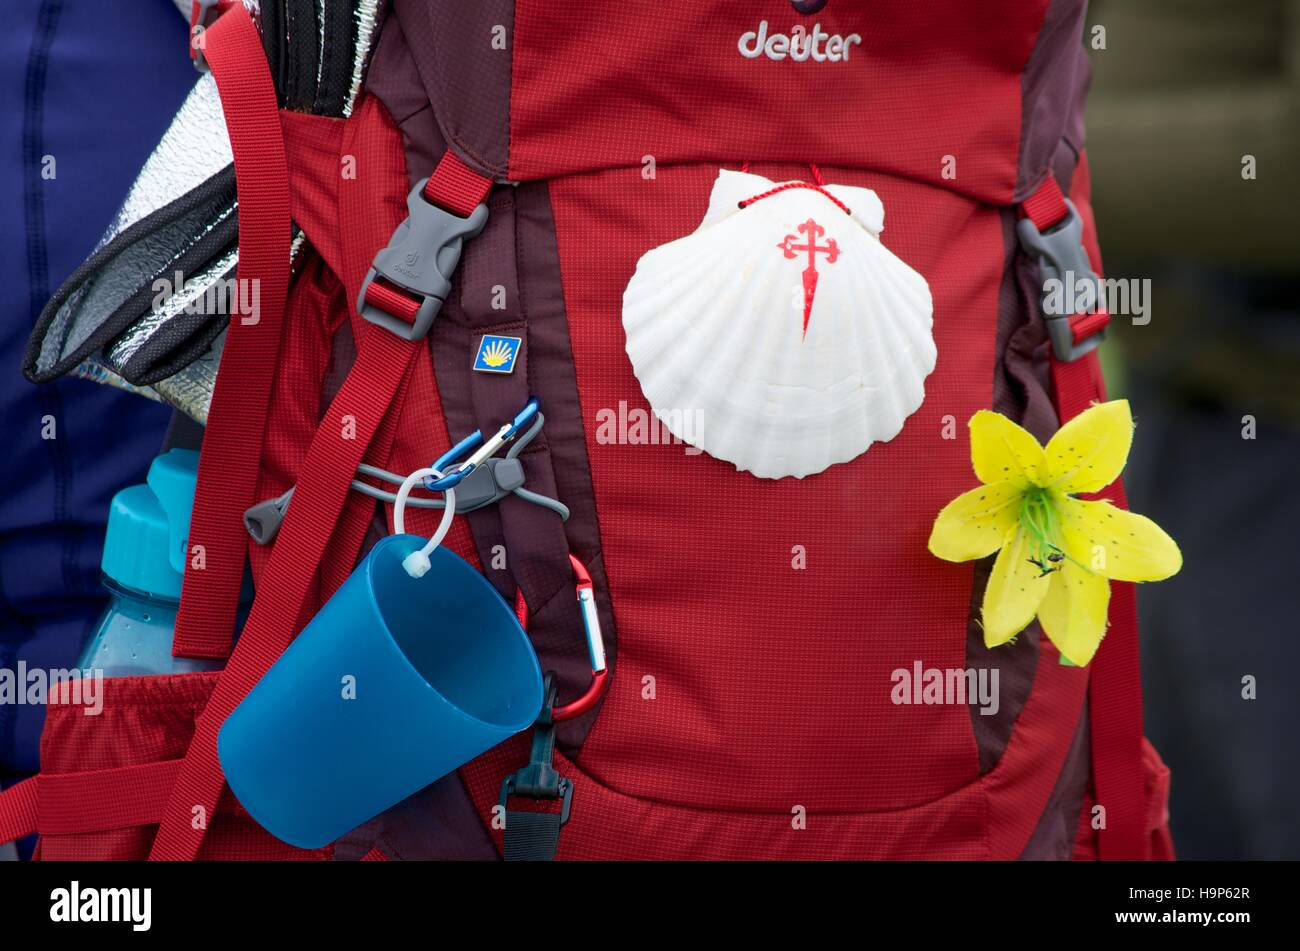 A pilgrim's rucksack on the pilgrim route to Santiago de Compostela - Stock Image